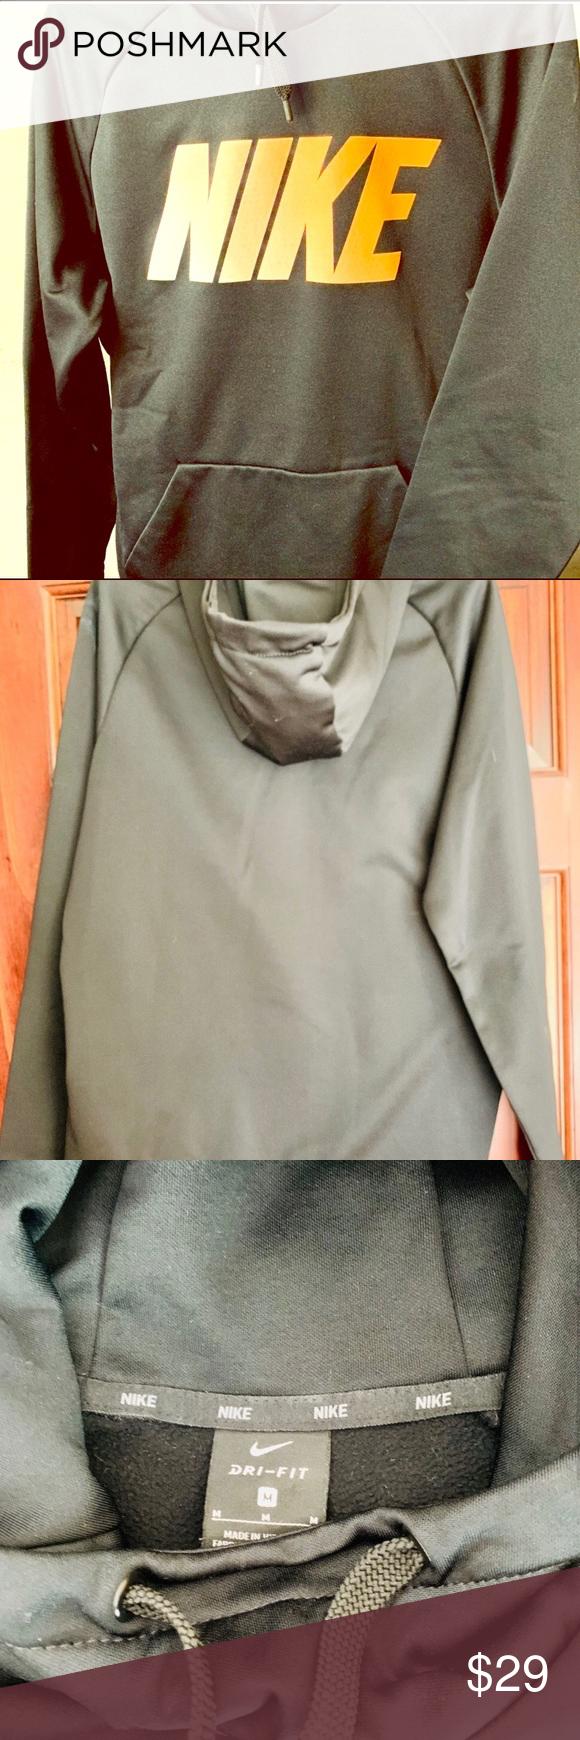 Nike Dri Fit Hooded Sweatshirt Sz M Hooded Sweatshirts Sweatshirts Nike Dri Fit [ 1740 x 580 Pixel ]